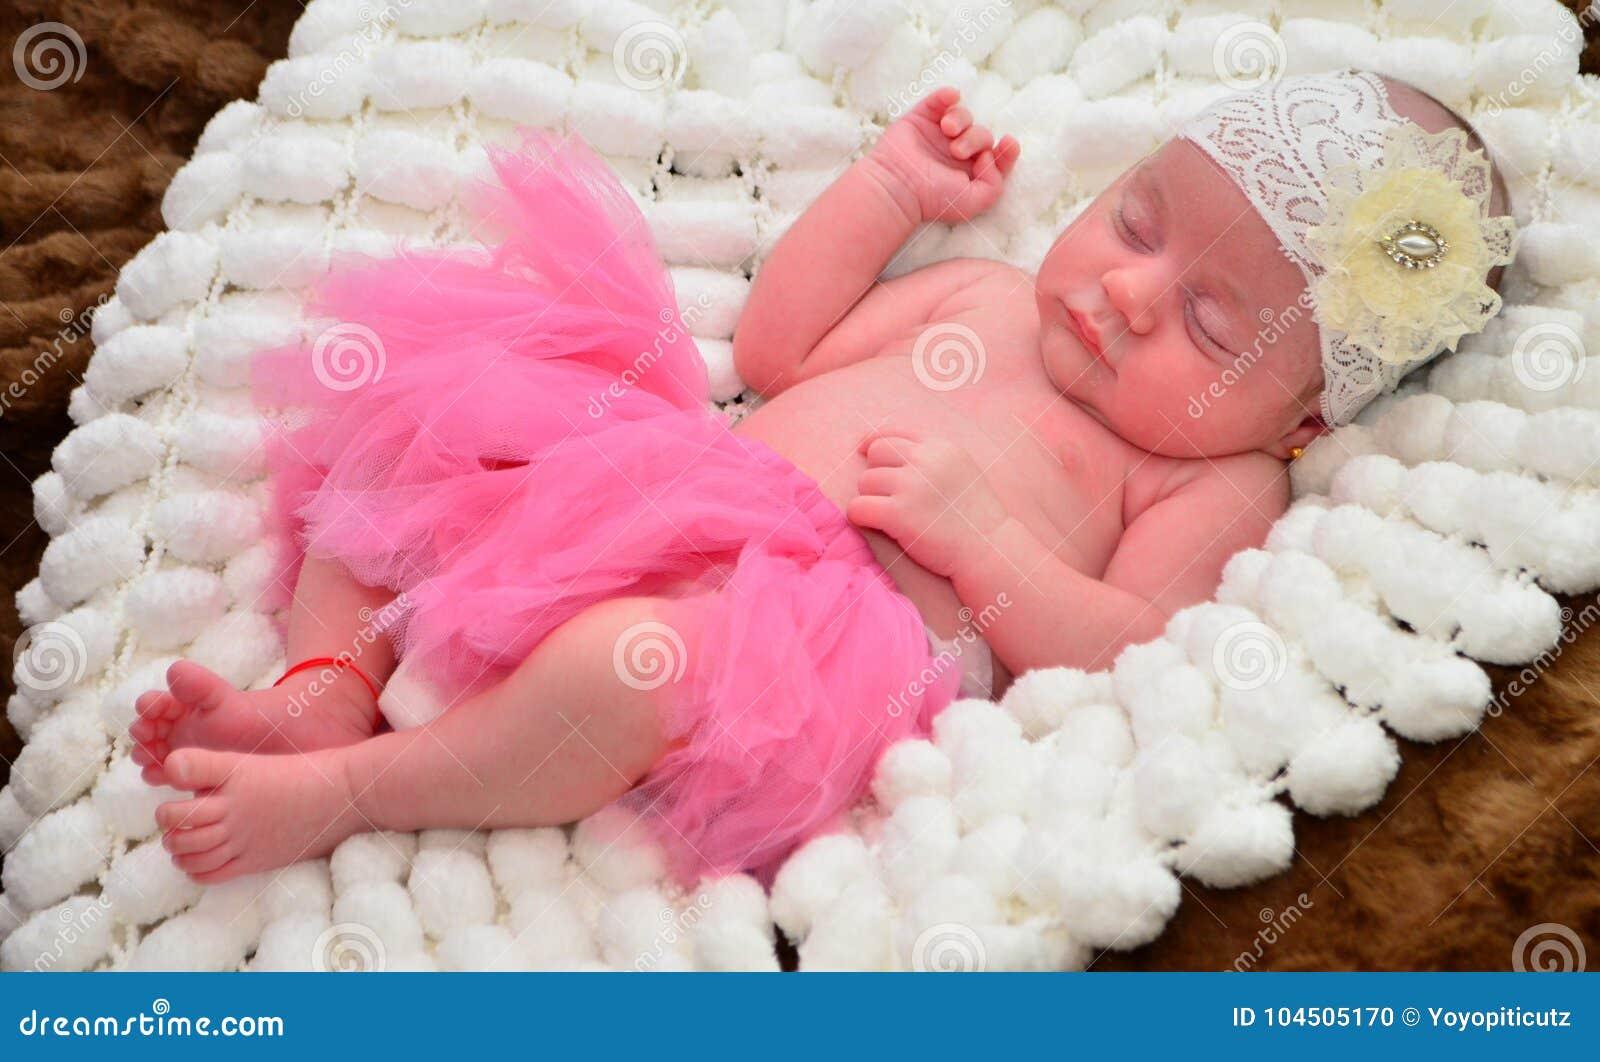 abc078b79 Baby Girl Sleeping During A Photoshoot. Stock Photo - Image of ...